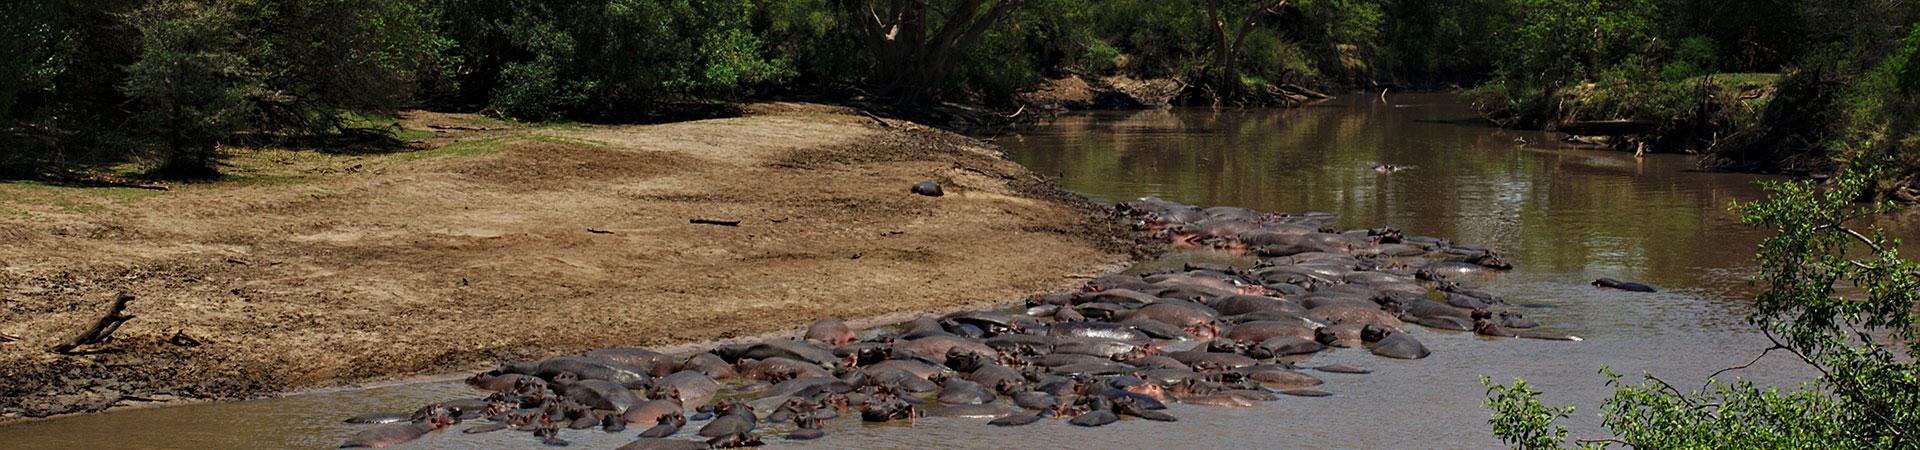 Hippo-in-Serengeti